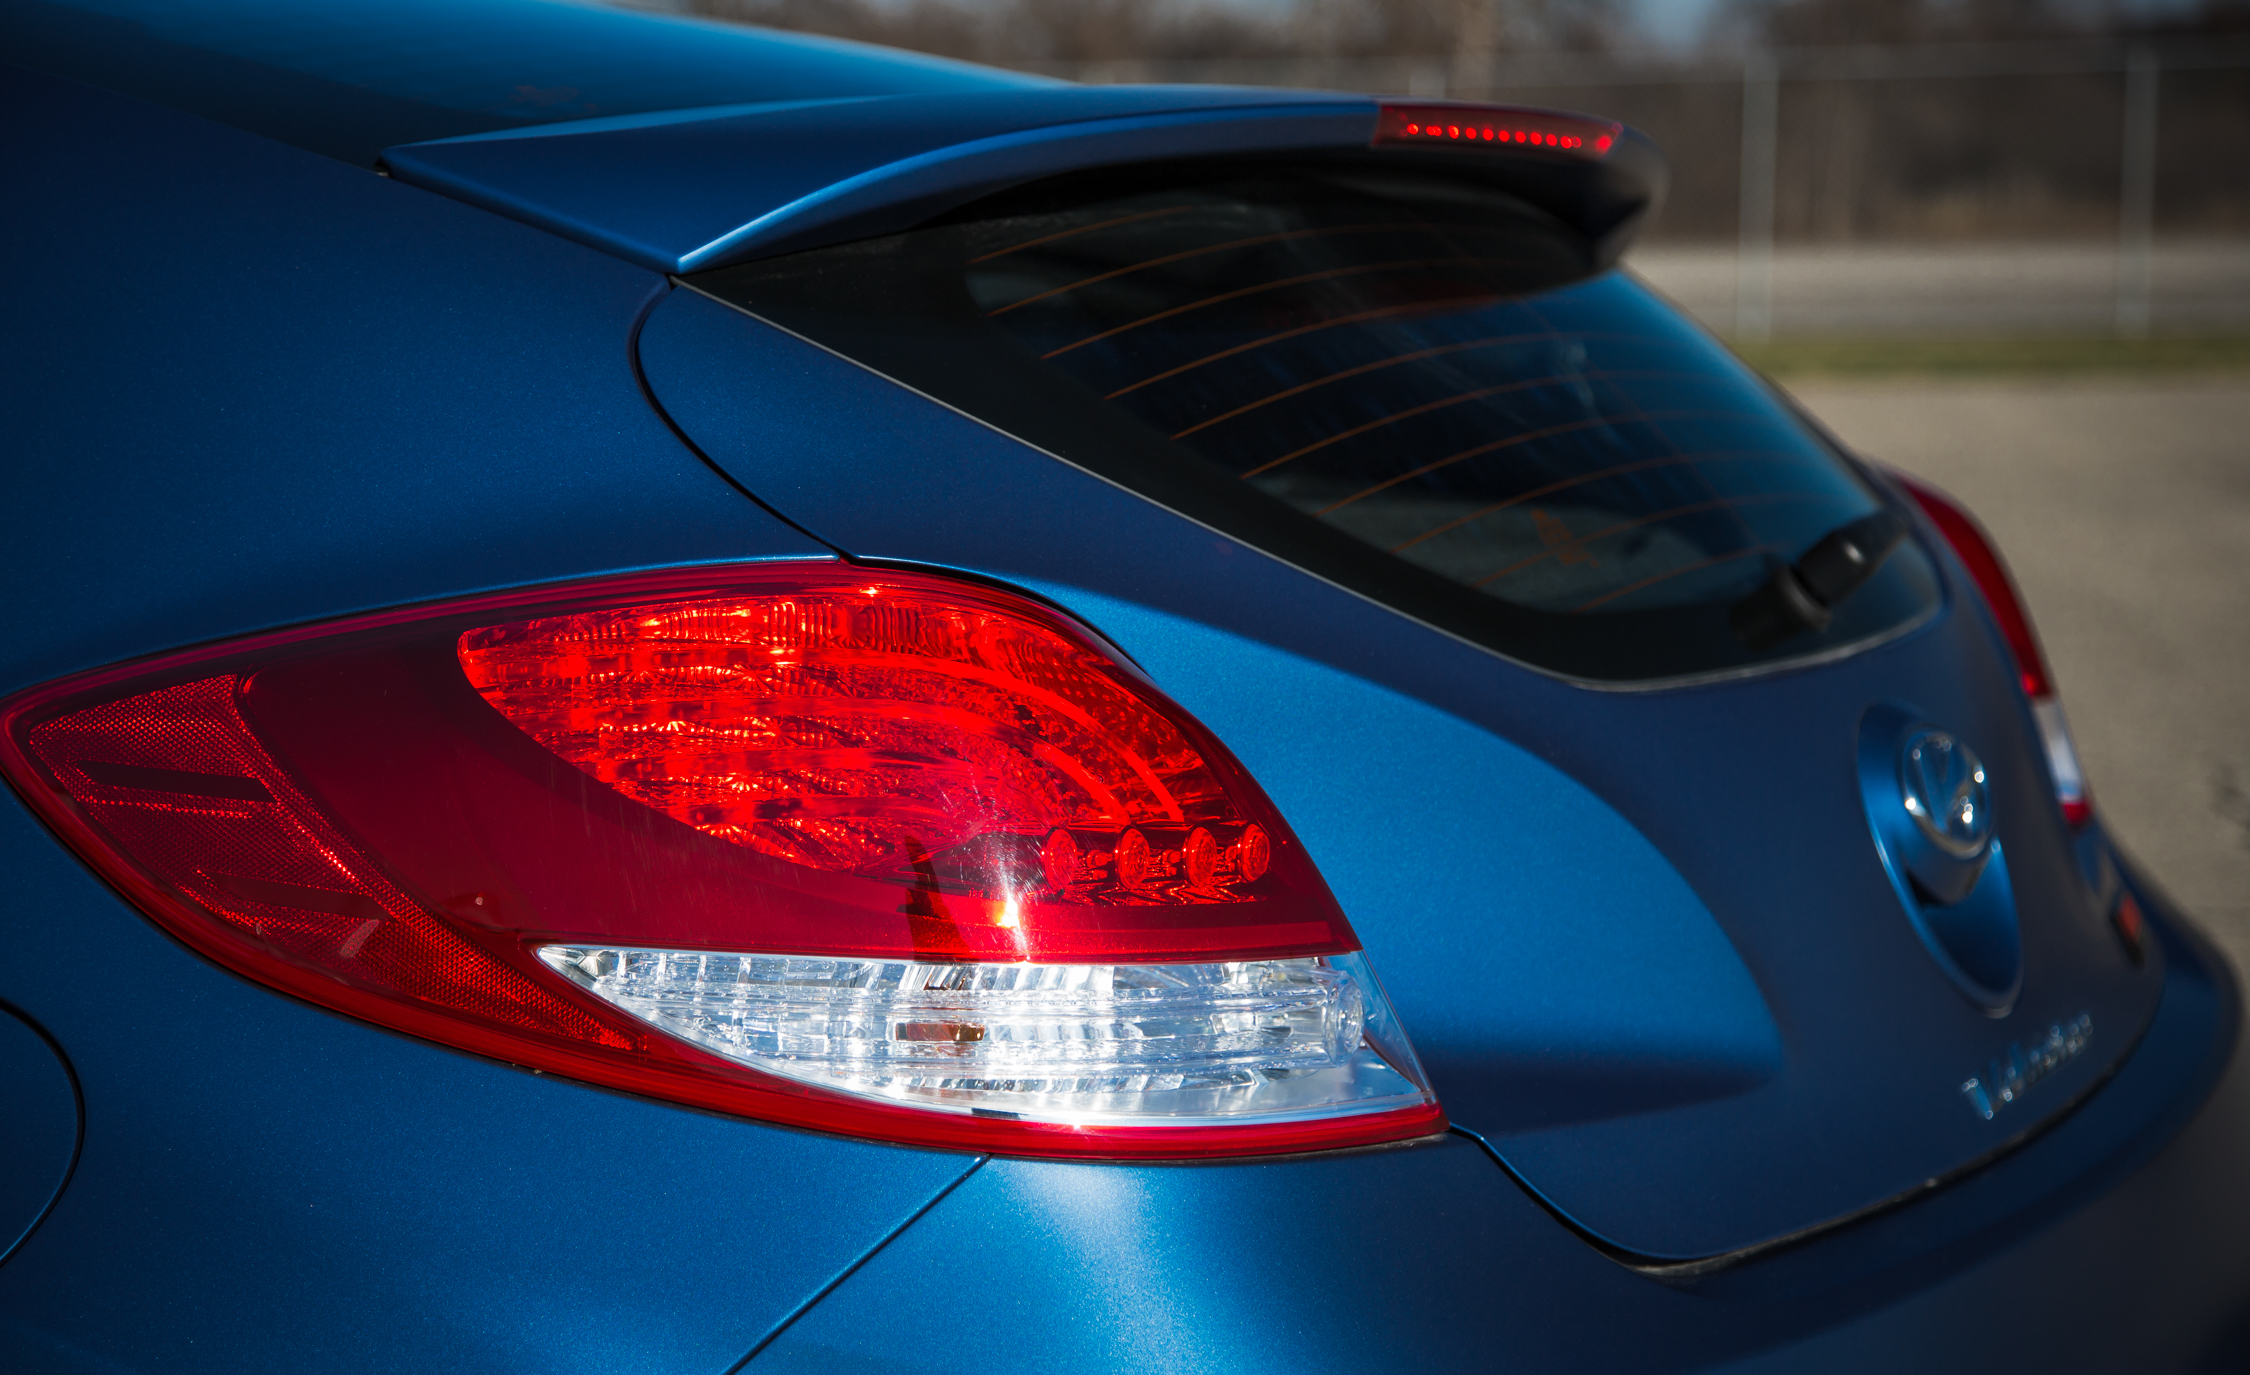 2016 Hyundai Veloster Turbo Rally Edition Exterior Taillight Rear Left